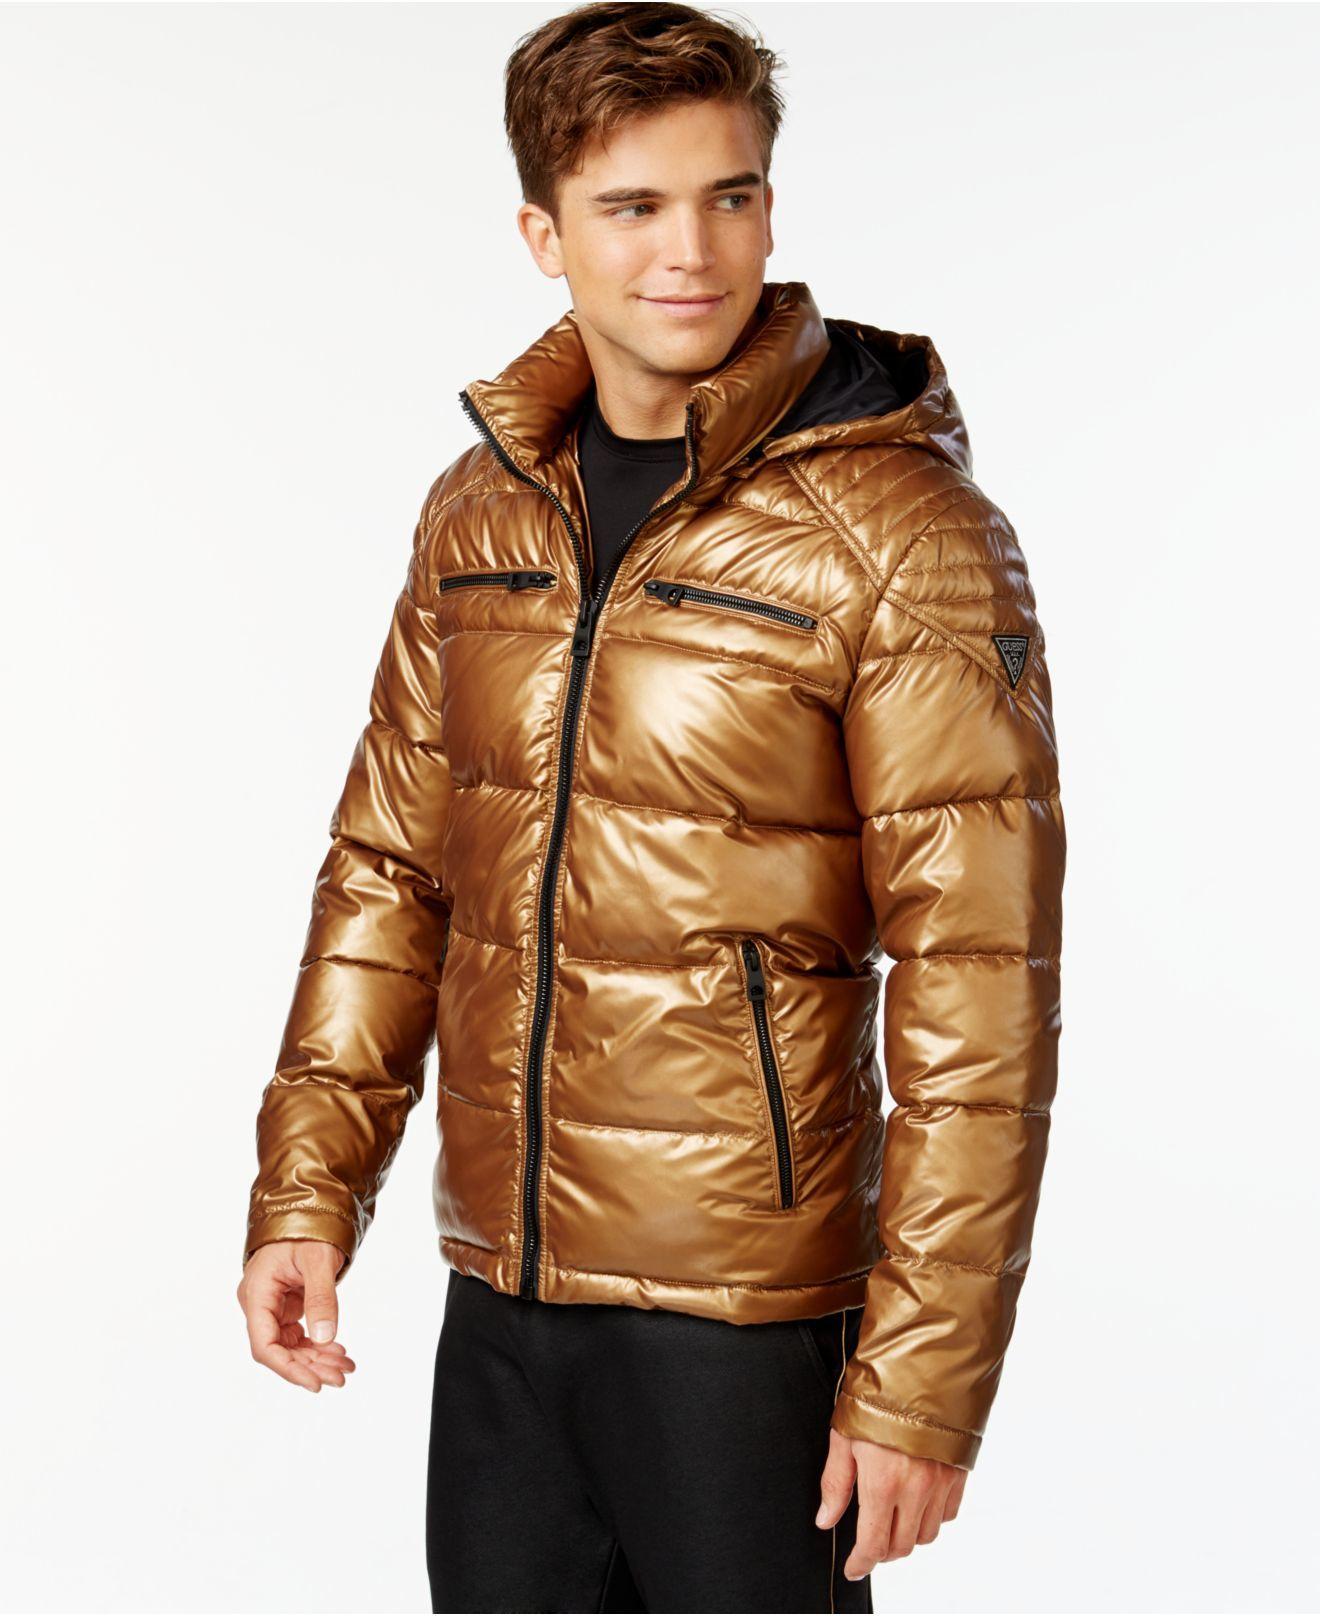 Guess Copper Pantone Hooded Puffer Jacket Gold Product 0 276841713 Normal Jpeg 1320 1616 Lack Kleidung Daunenjacke Jacken [ 1616 x 1320 Pixel ]